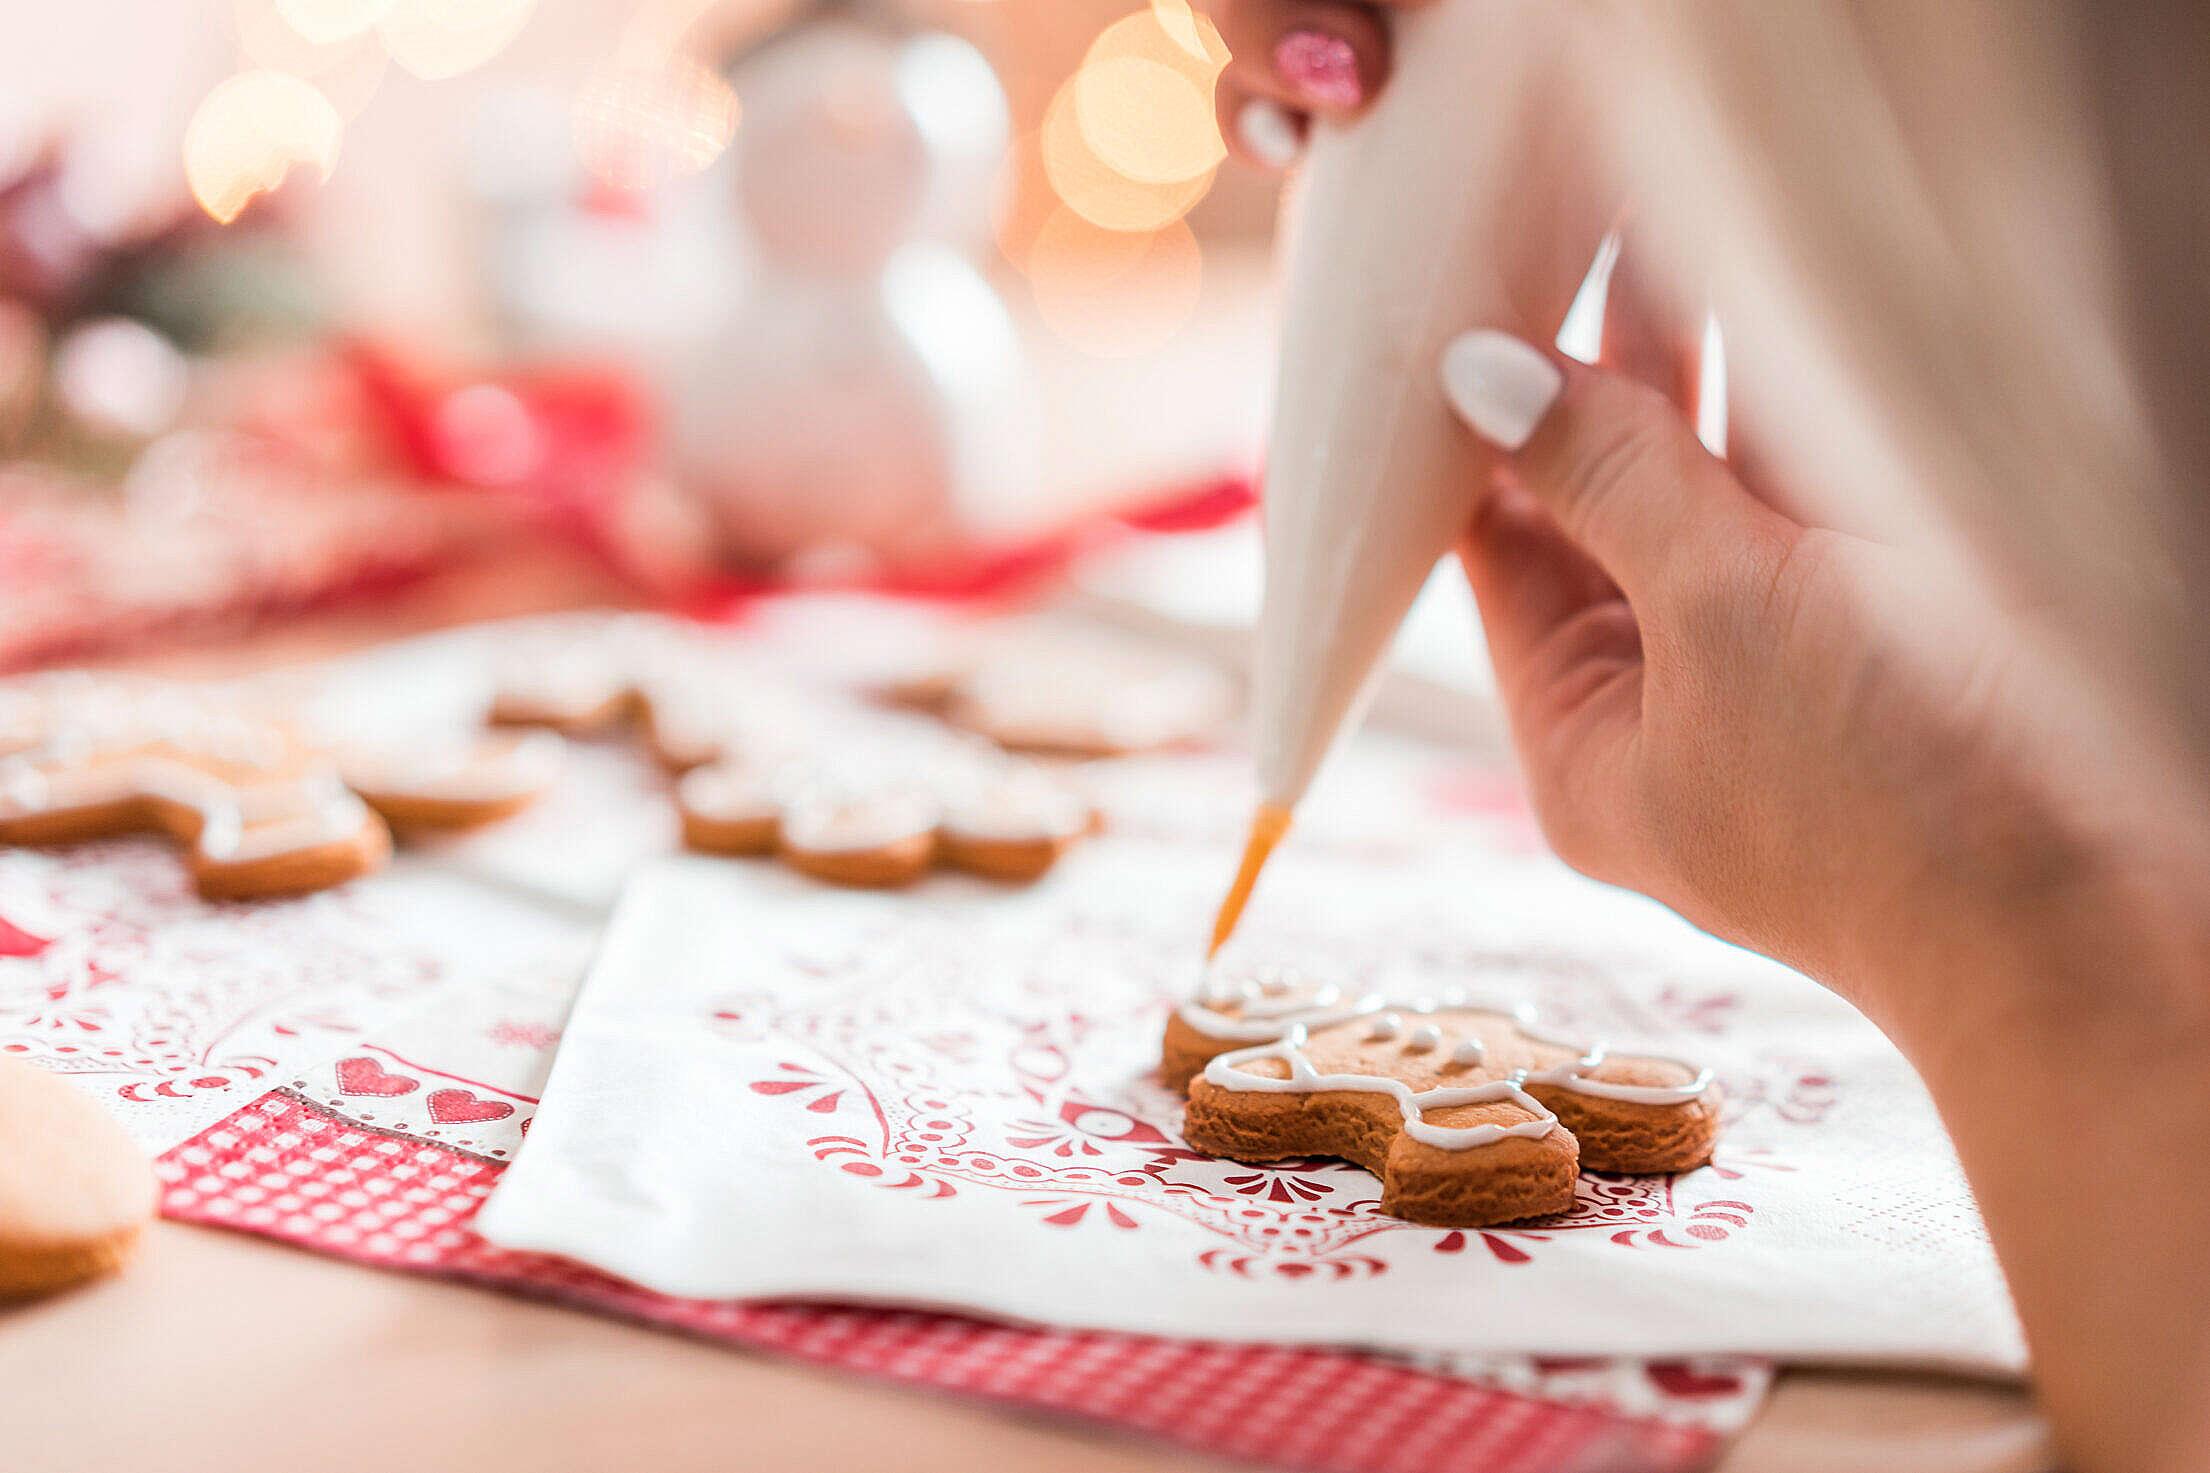 Decorating Gingerbread Man Free Stock Photo